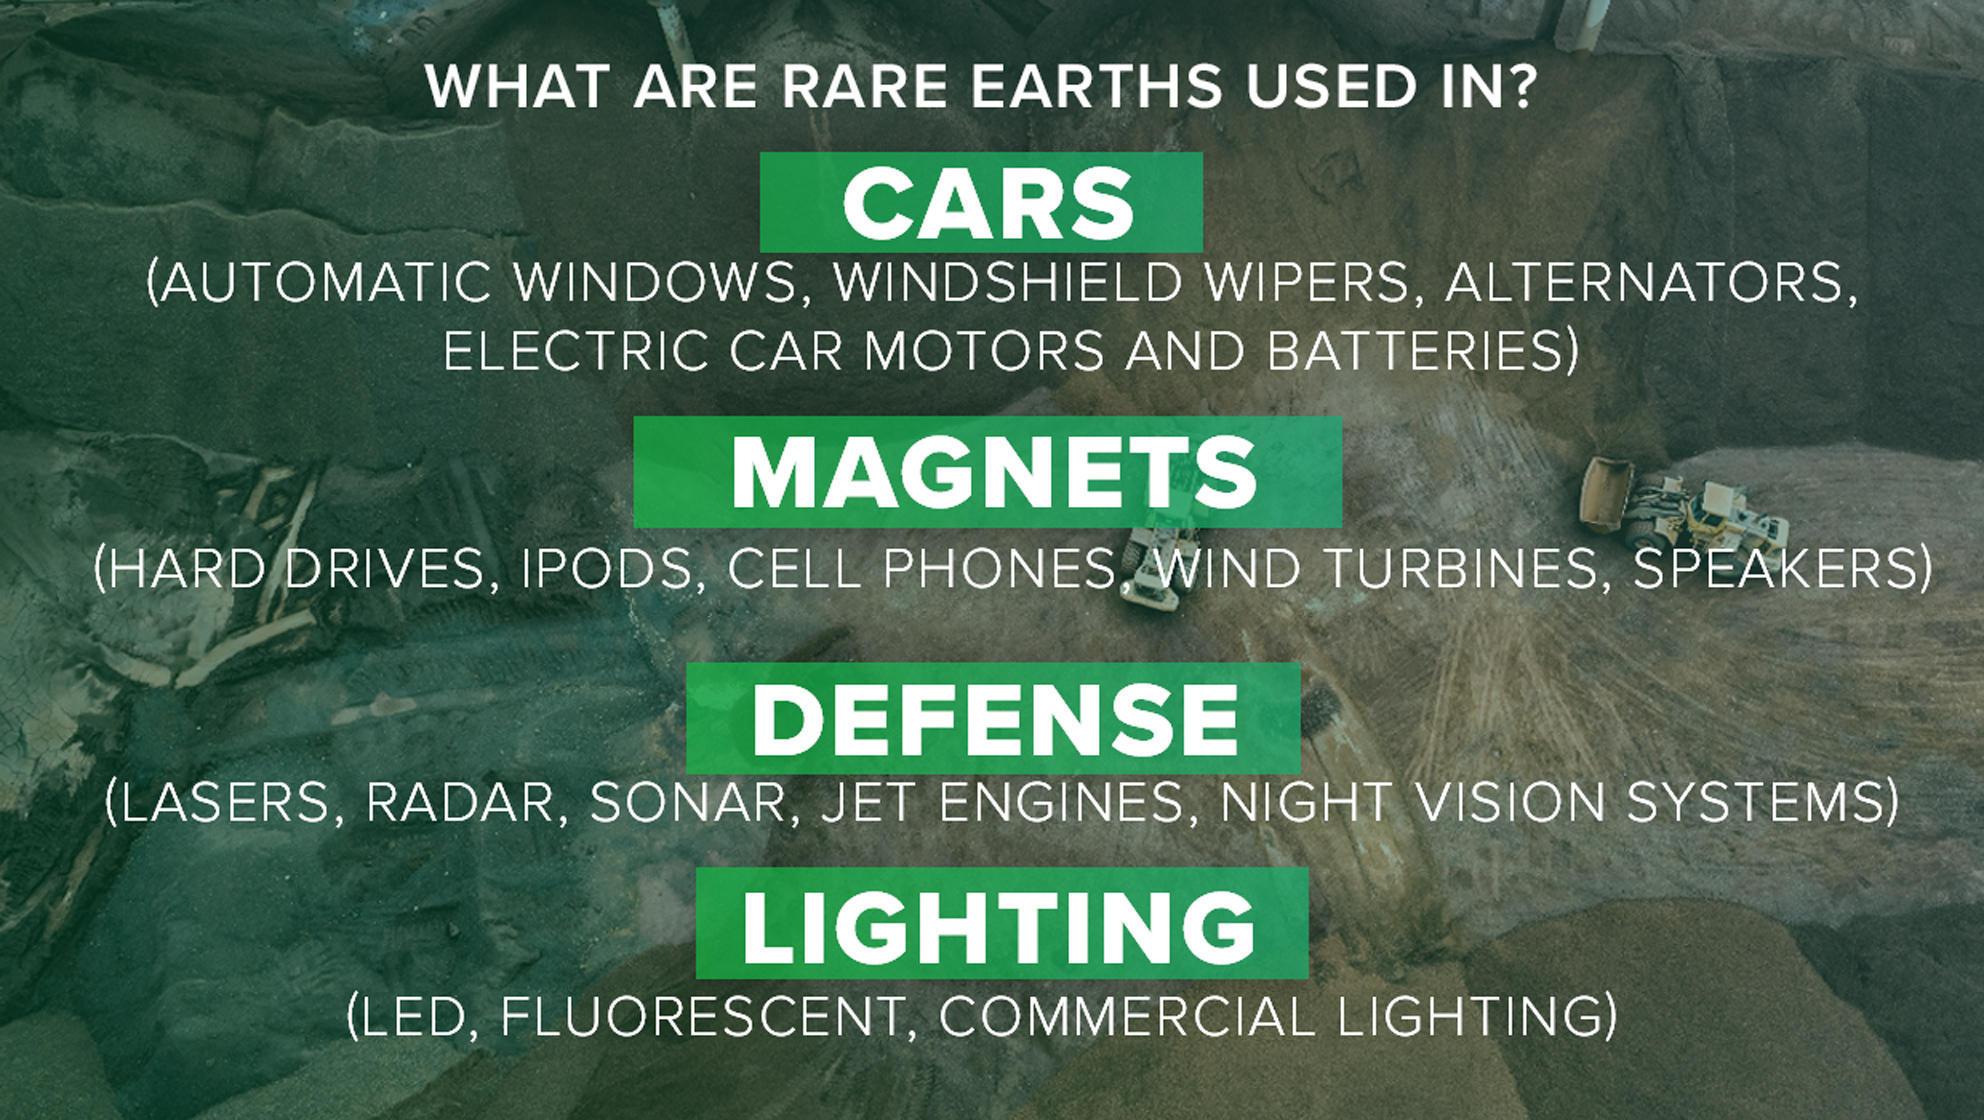 rare-earths.jpg